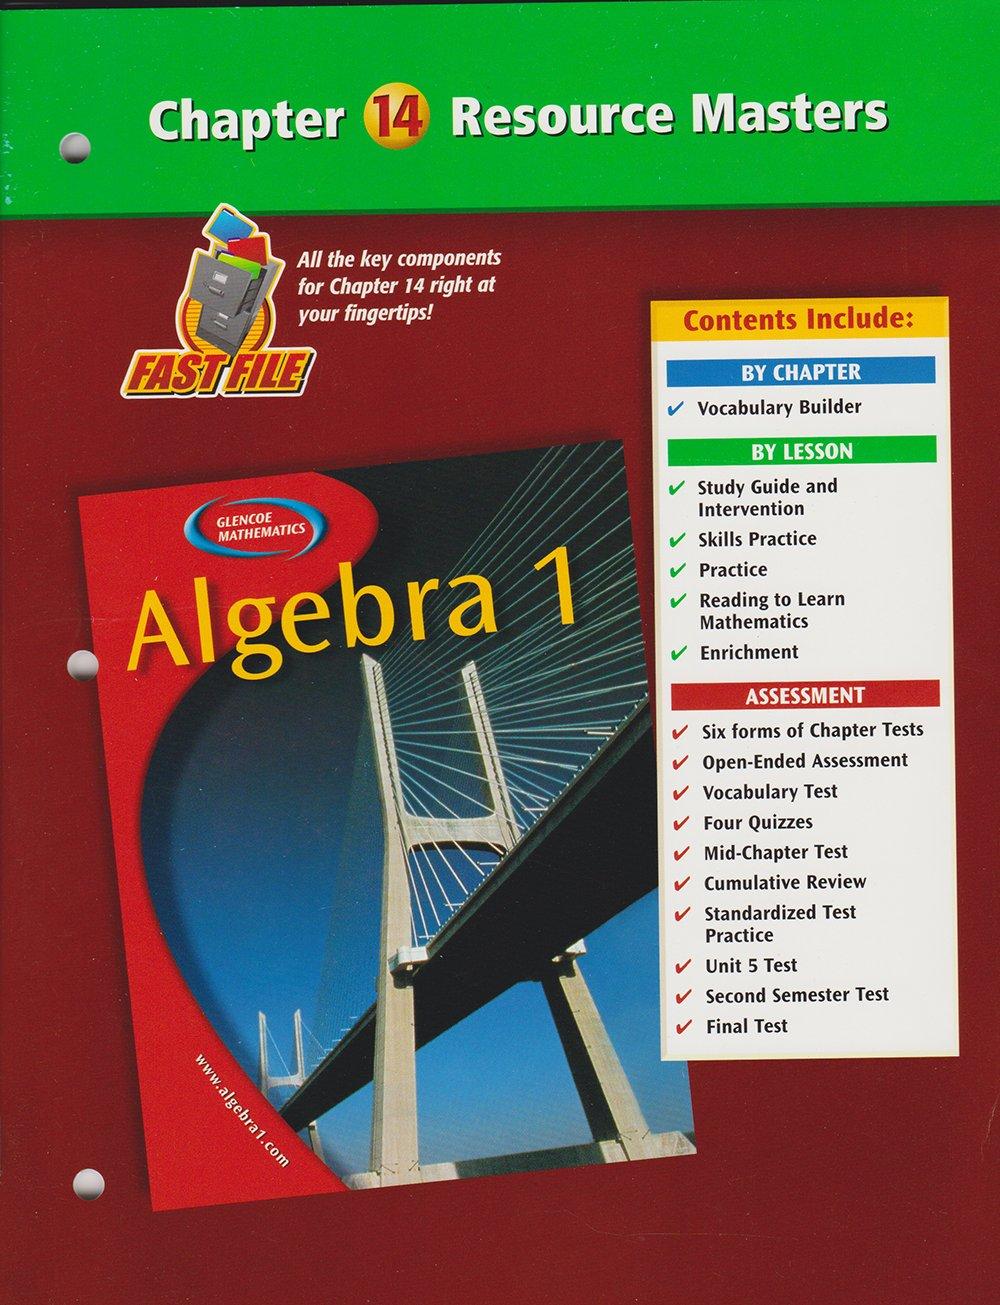 Algebra 1 Chapter 14 Resource Masters: Glencoe/McGraw-Hill: 9780078277382:  Amazon.com: Books